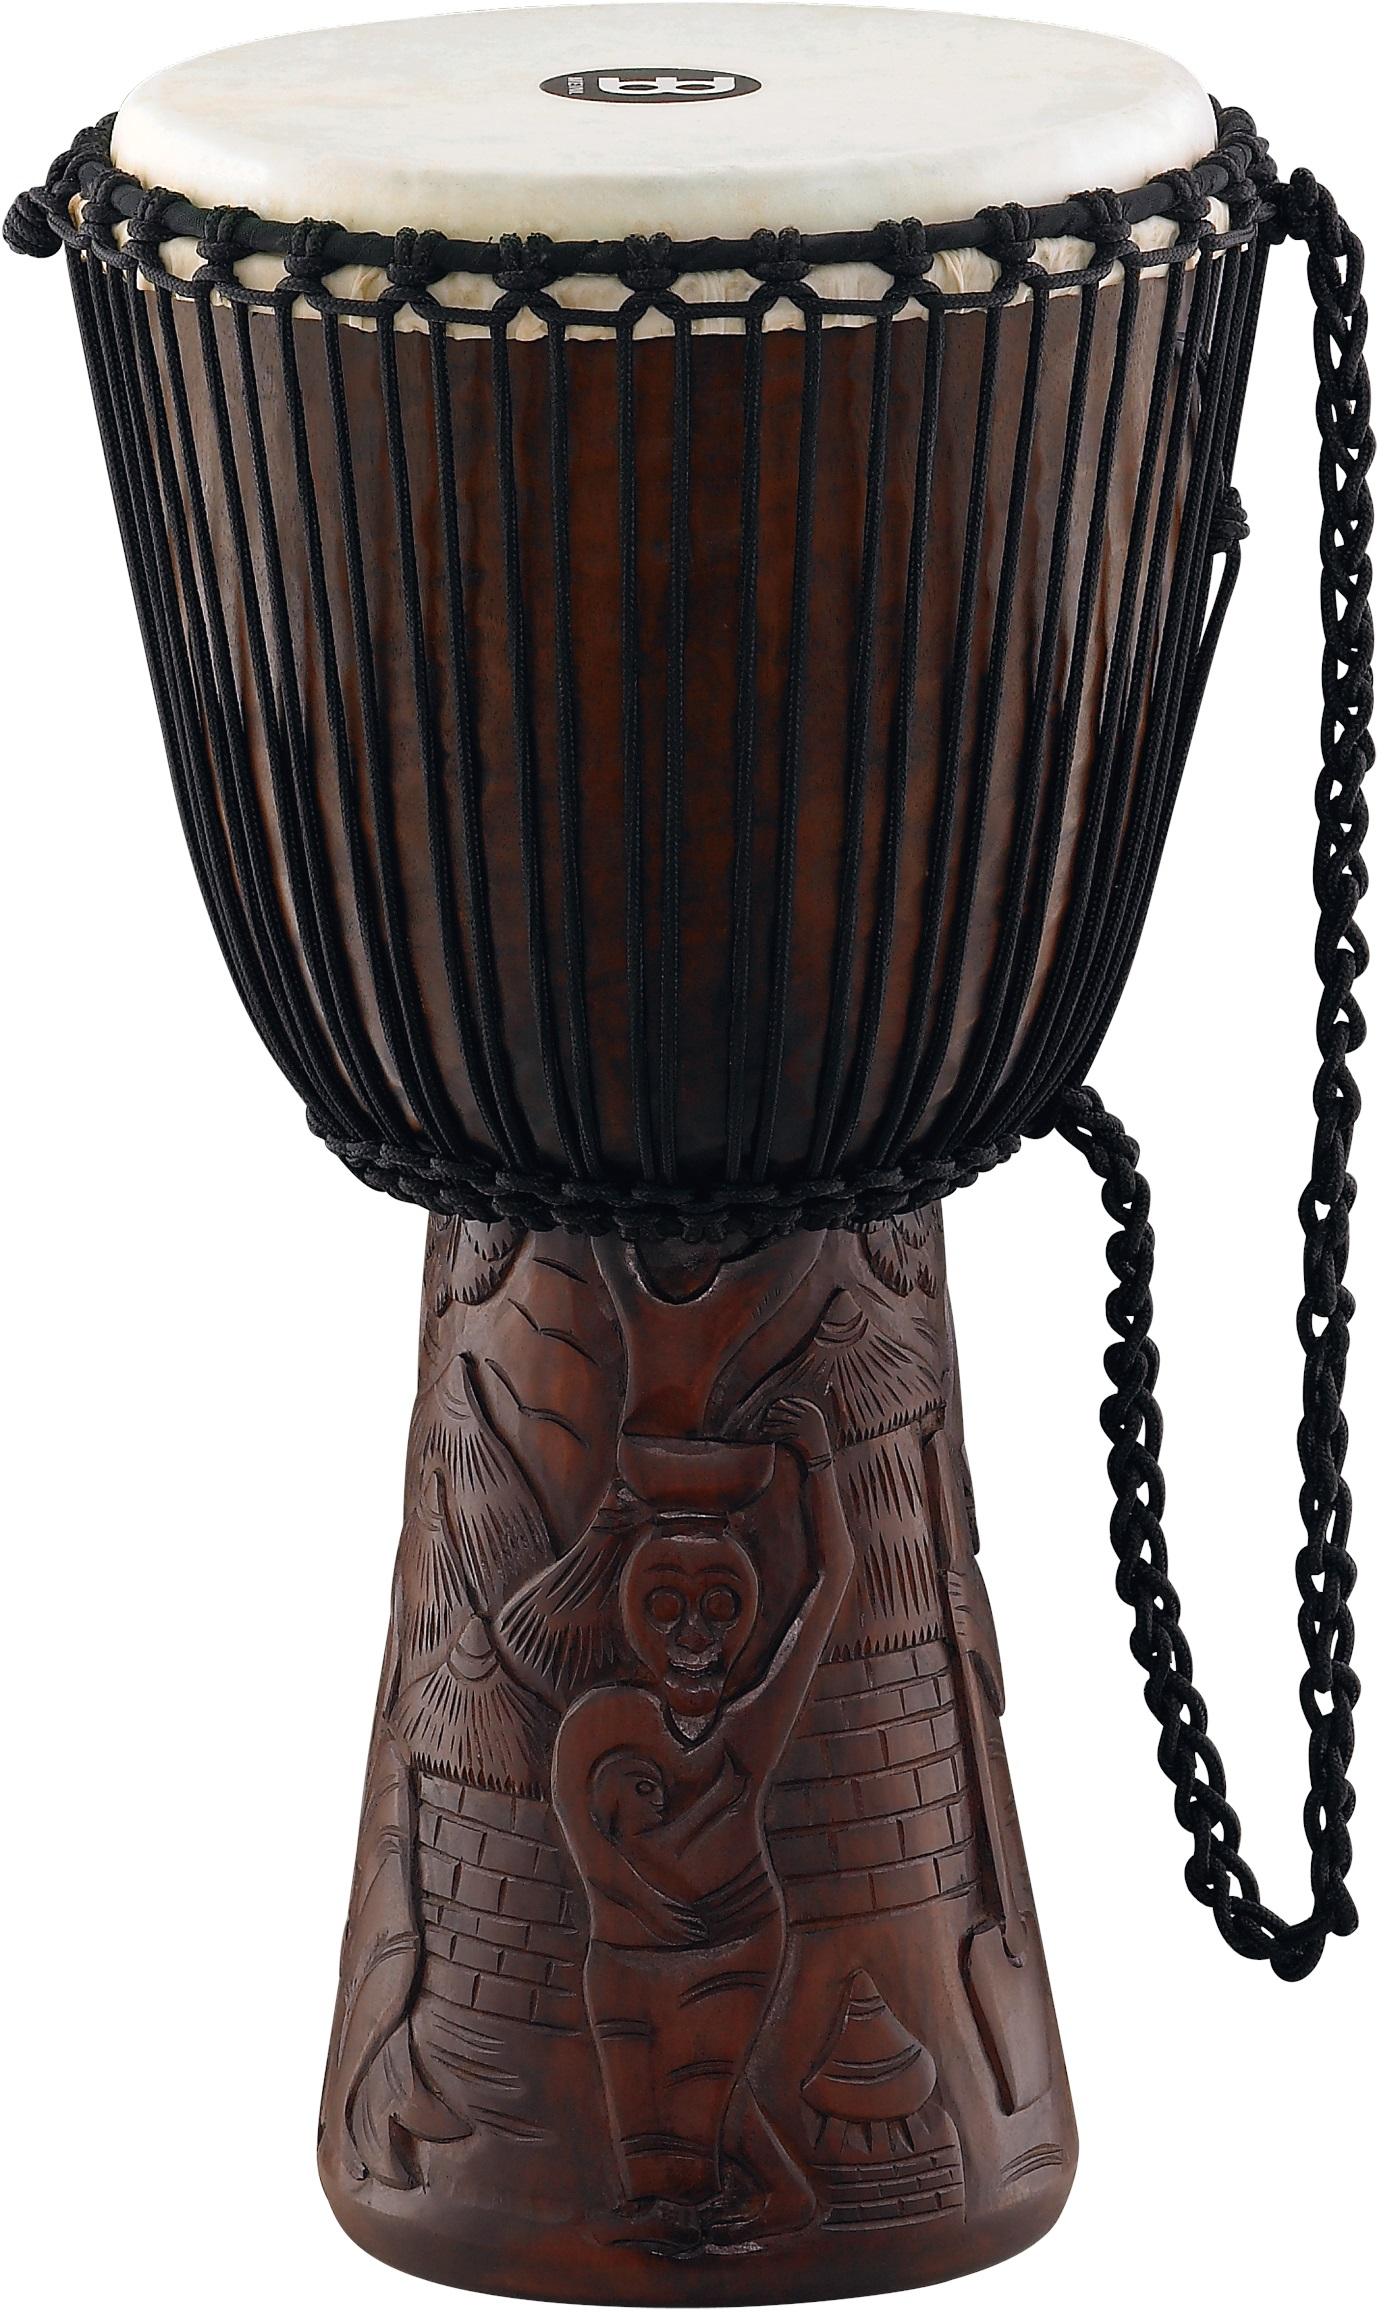 Meinl PROADJ2-L Professional African Series African